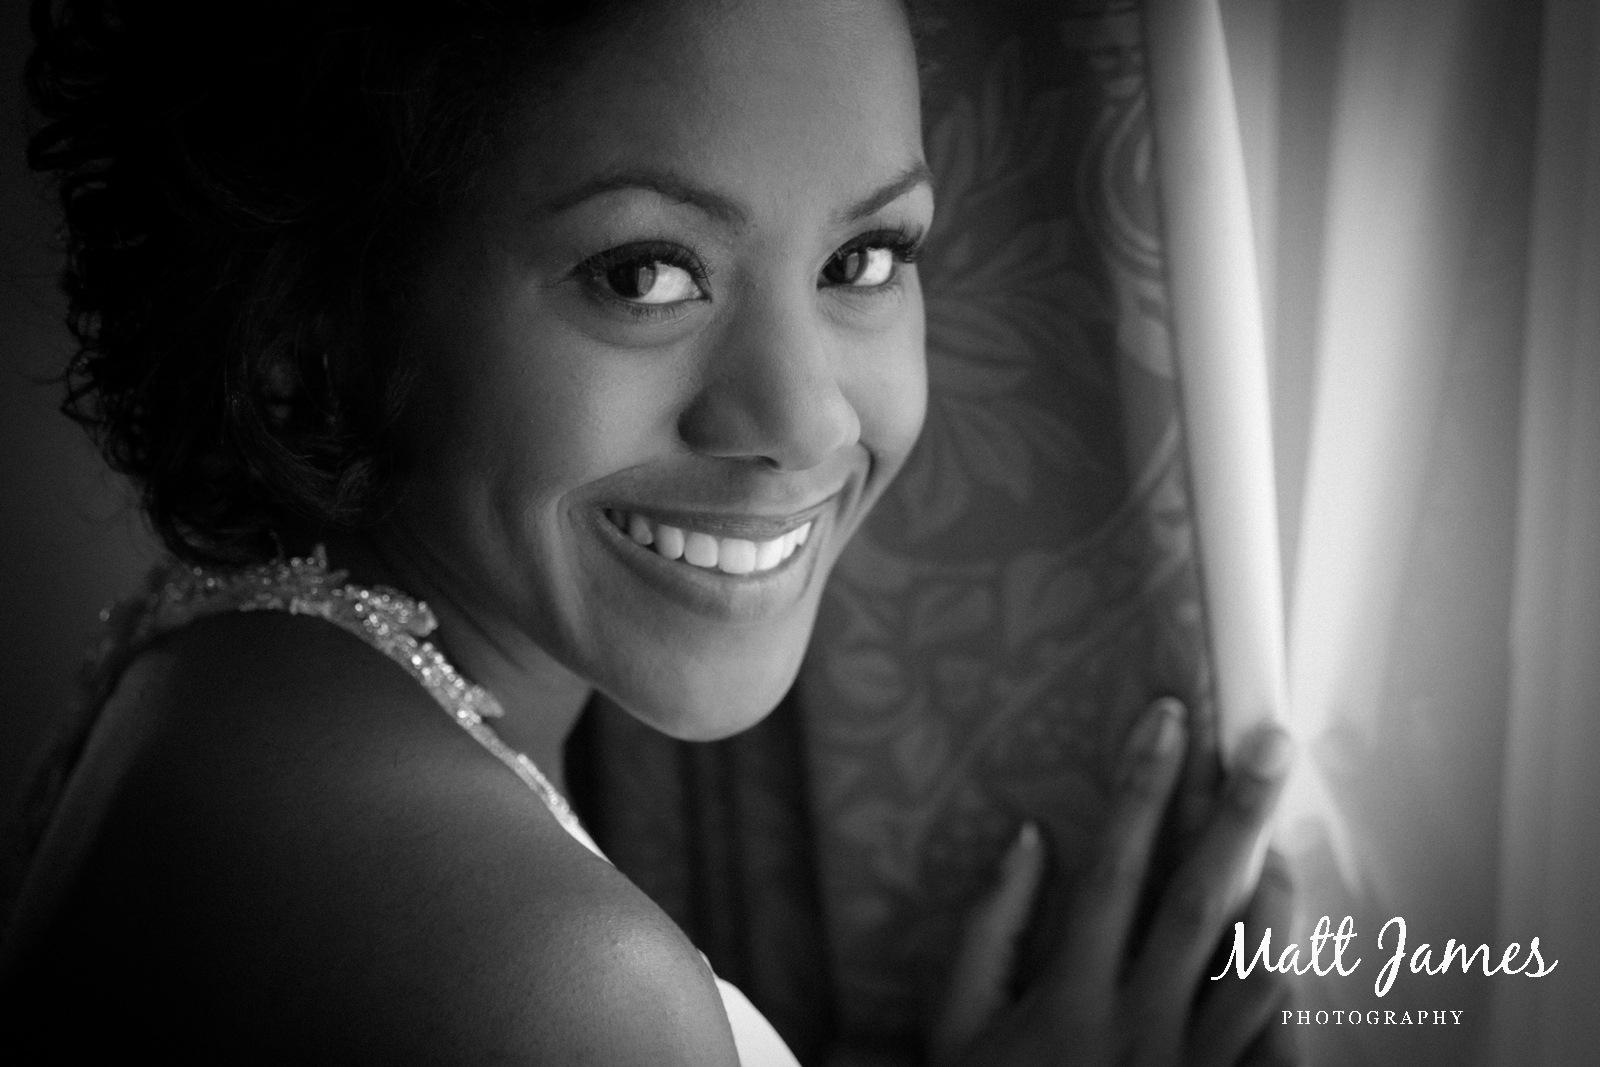 Sevenoaks-documentary-wedding-photographer-8